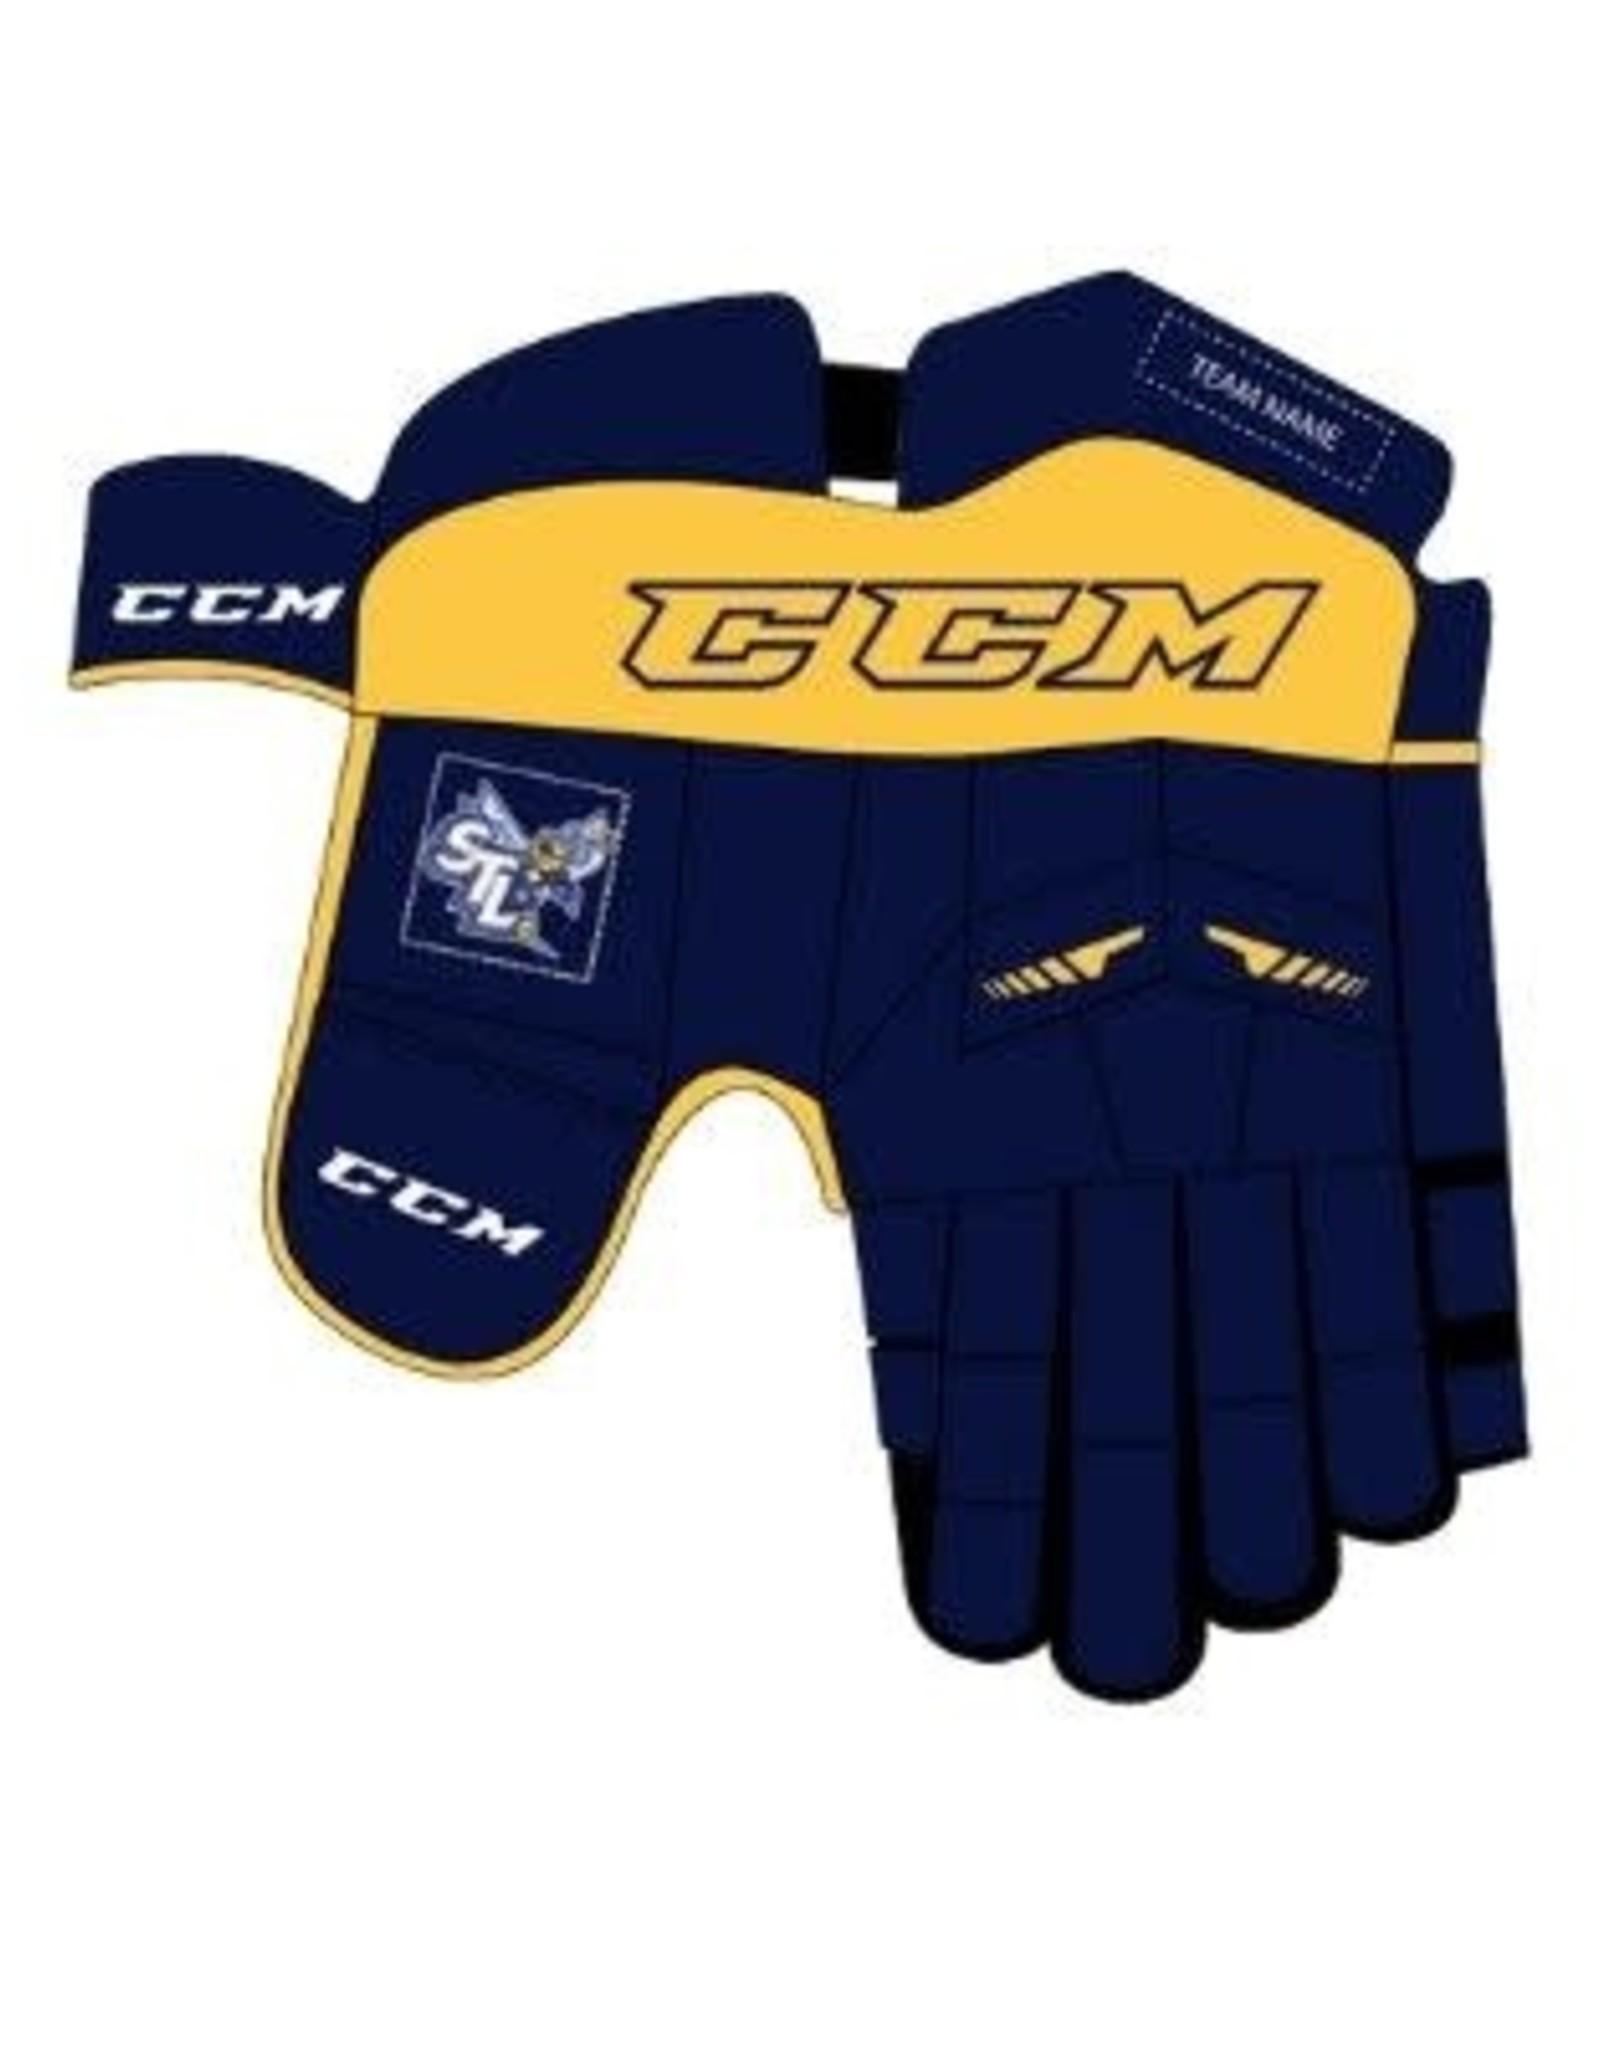 CCM Custom CCM St. Louis Sting Glove (SENIOR) Navy